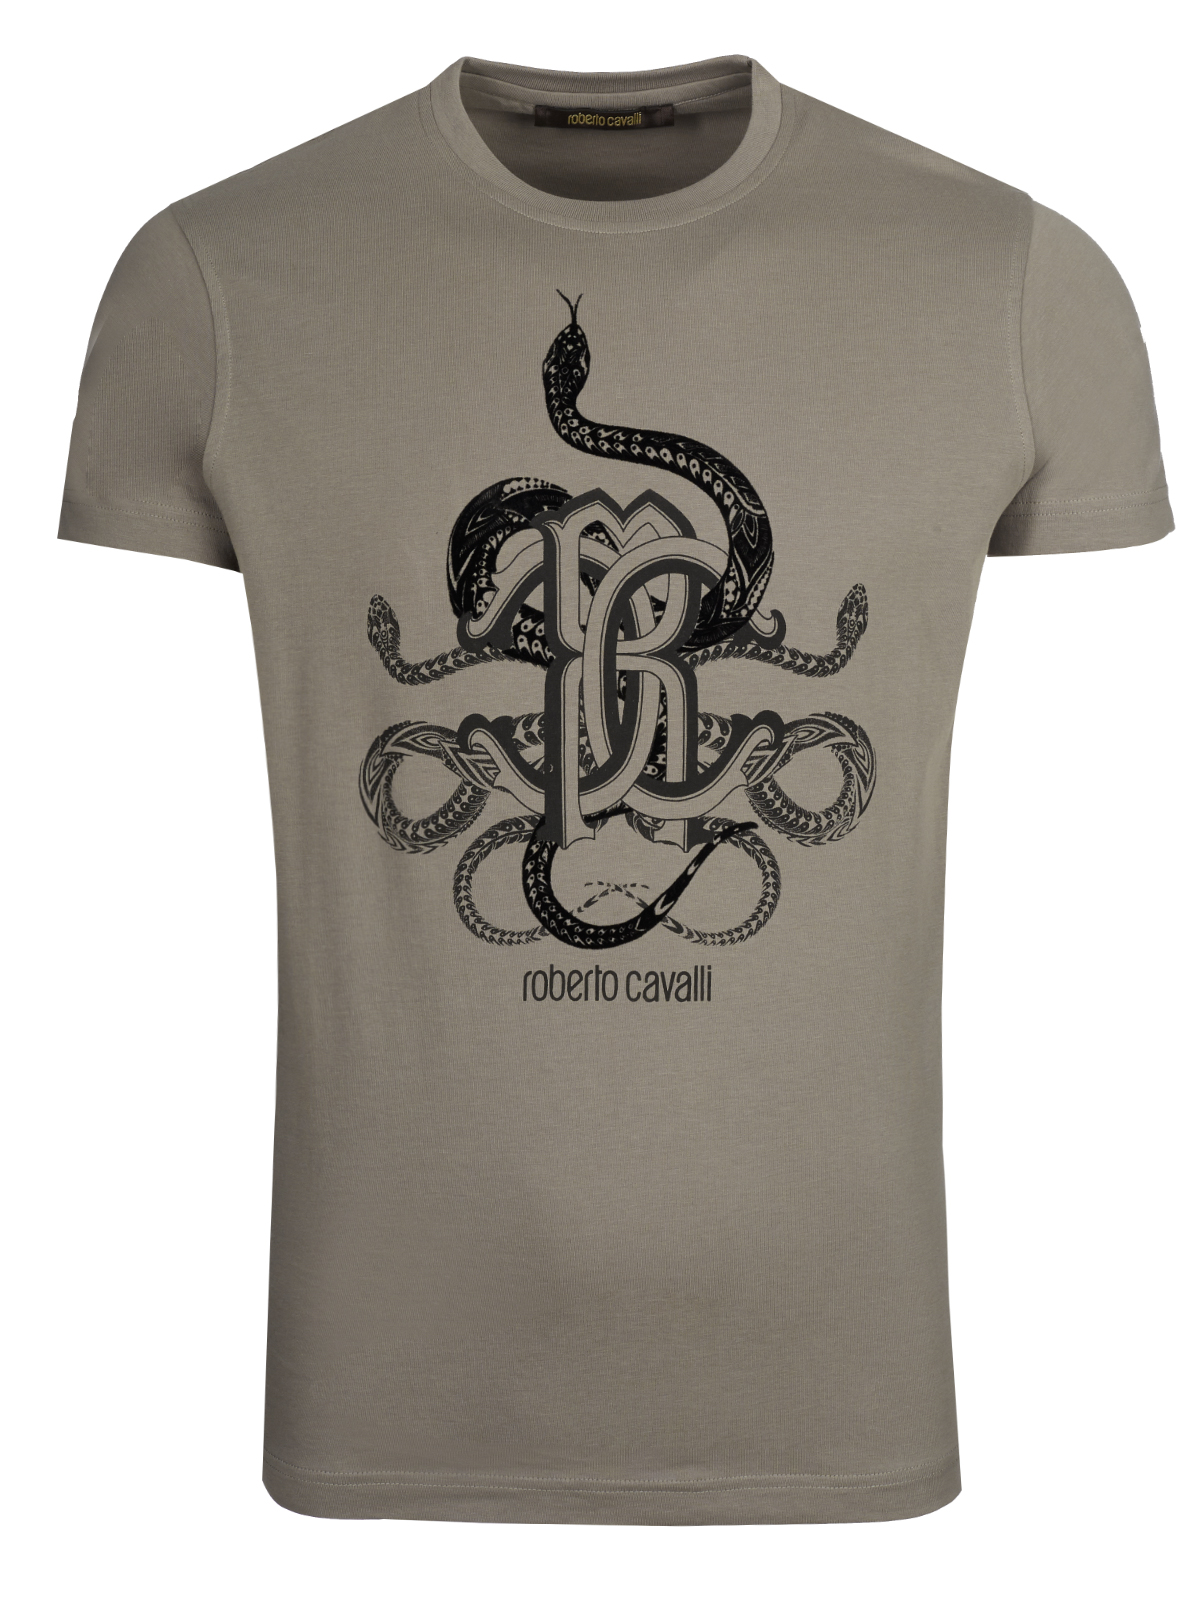 online store 8b779 64026 Roberto Cavalli T-shirt grey